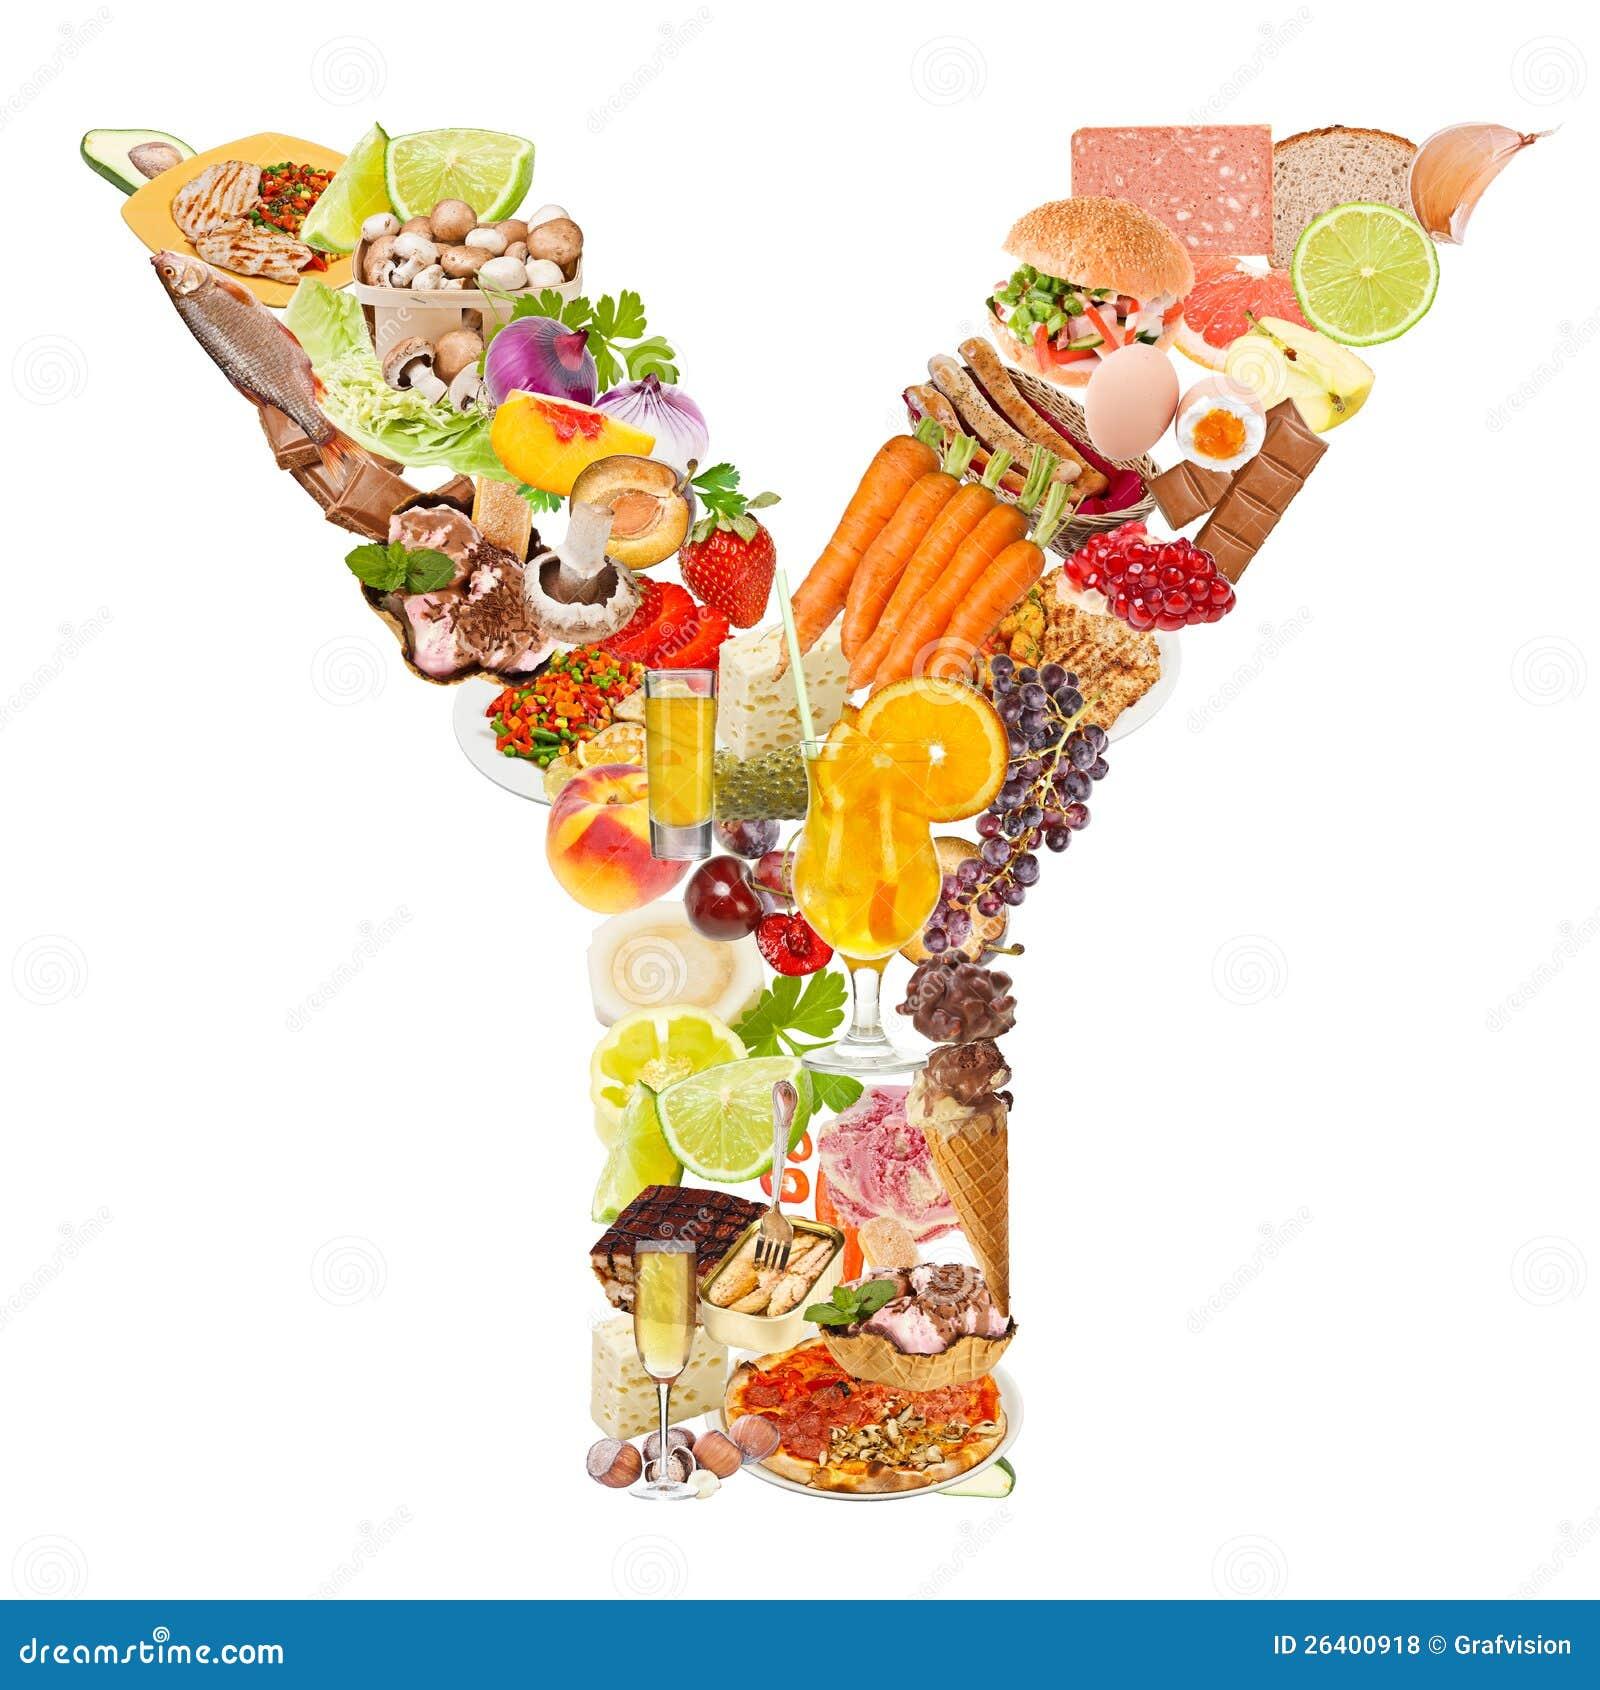 Y Food